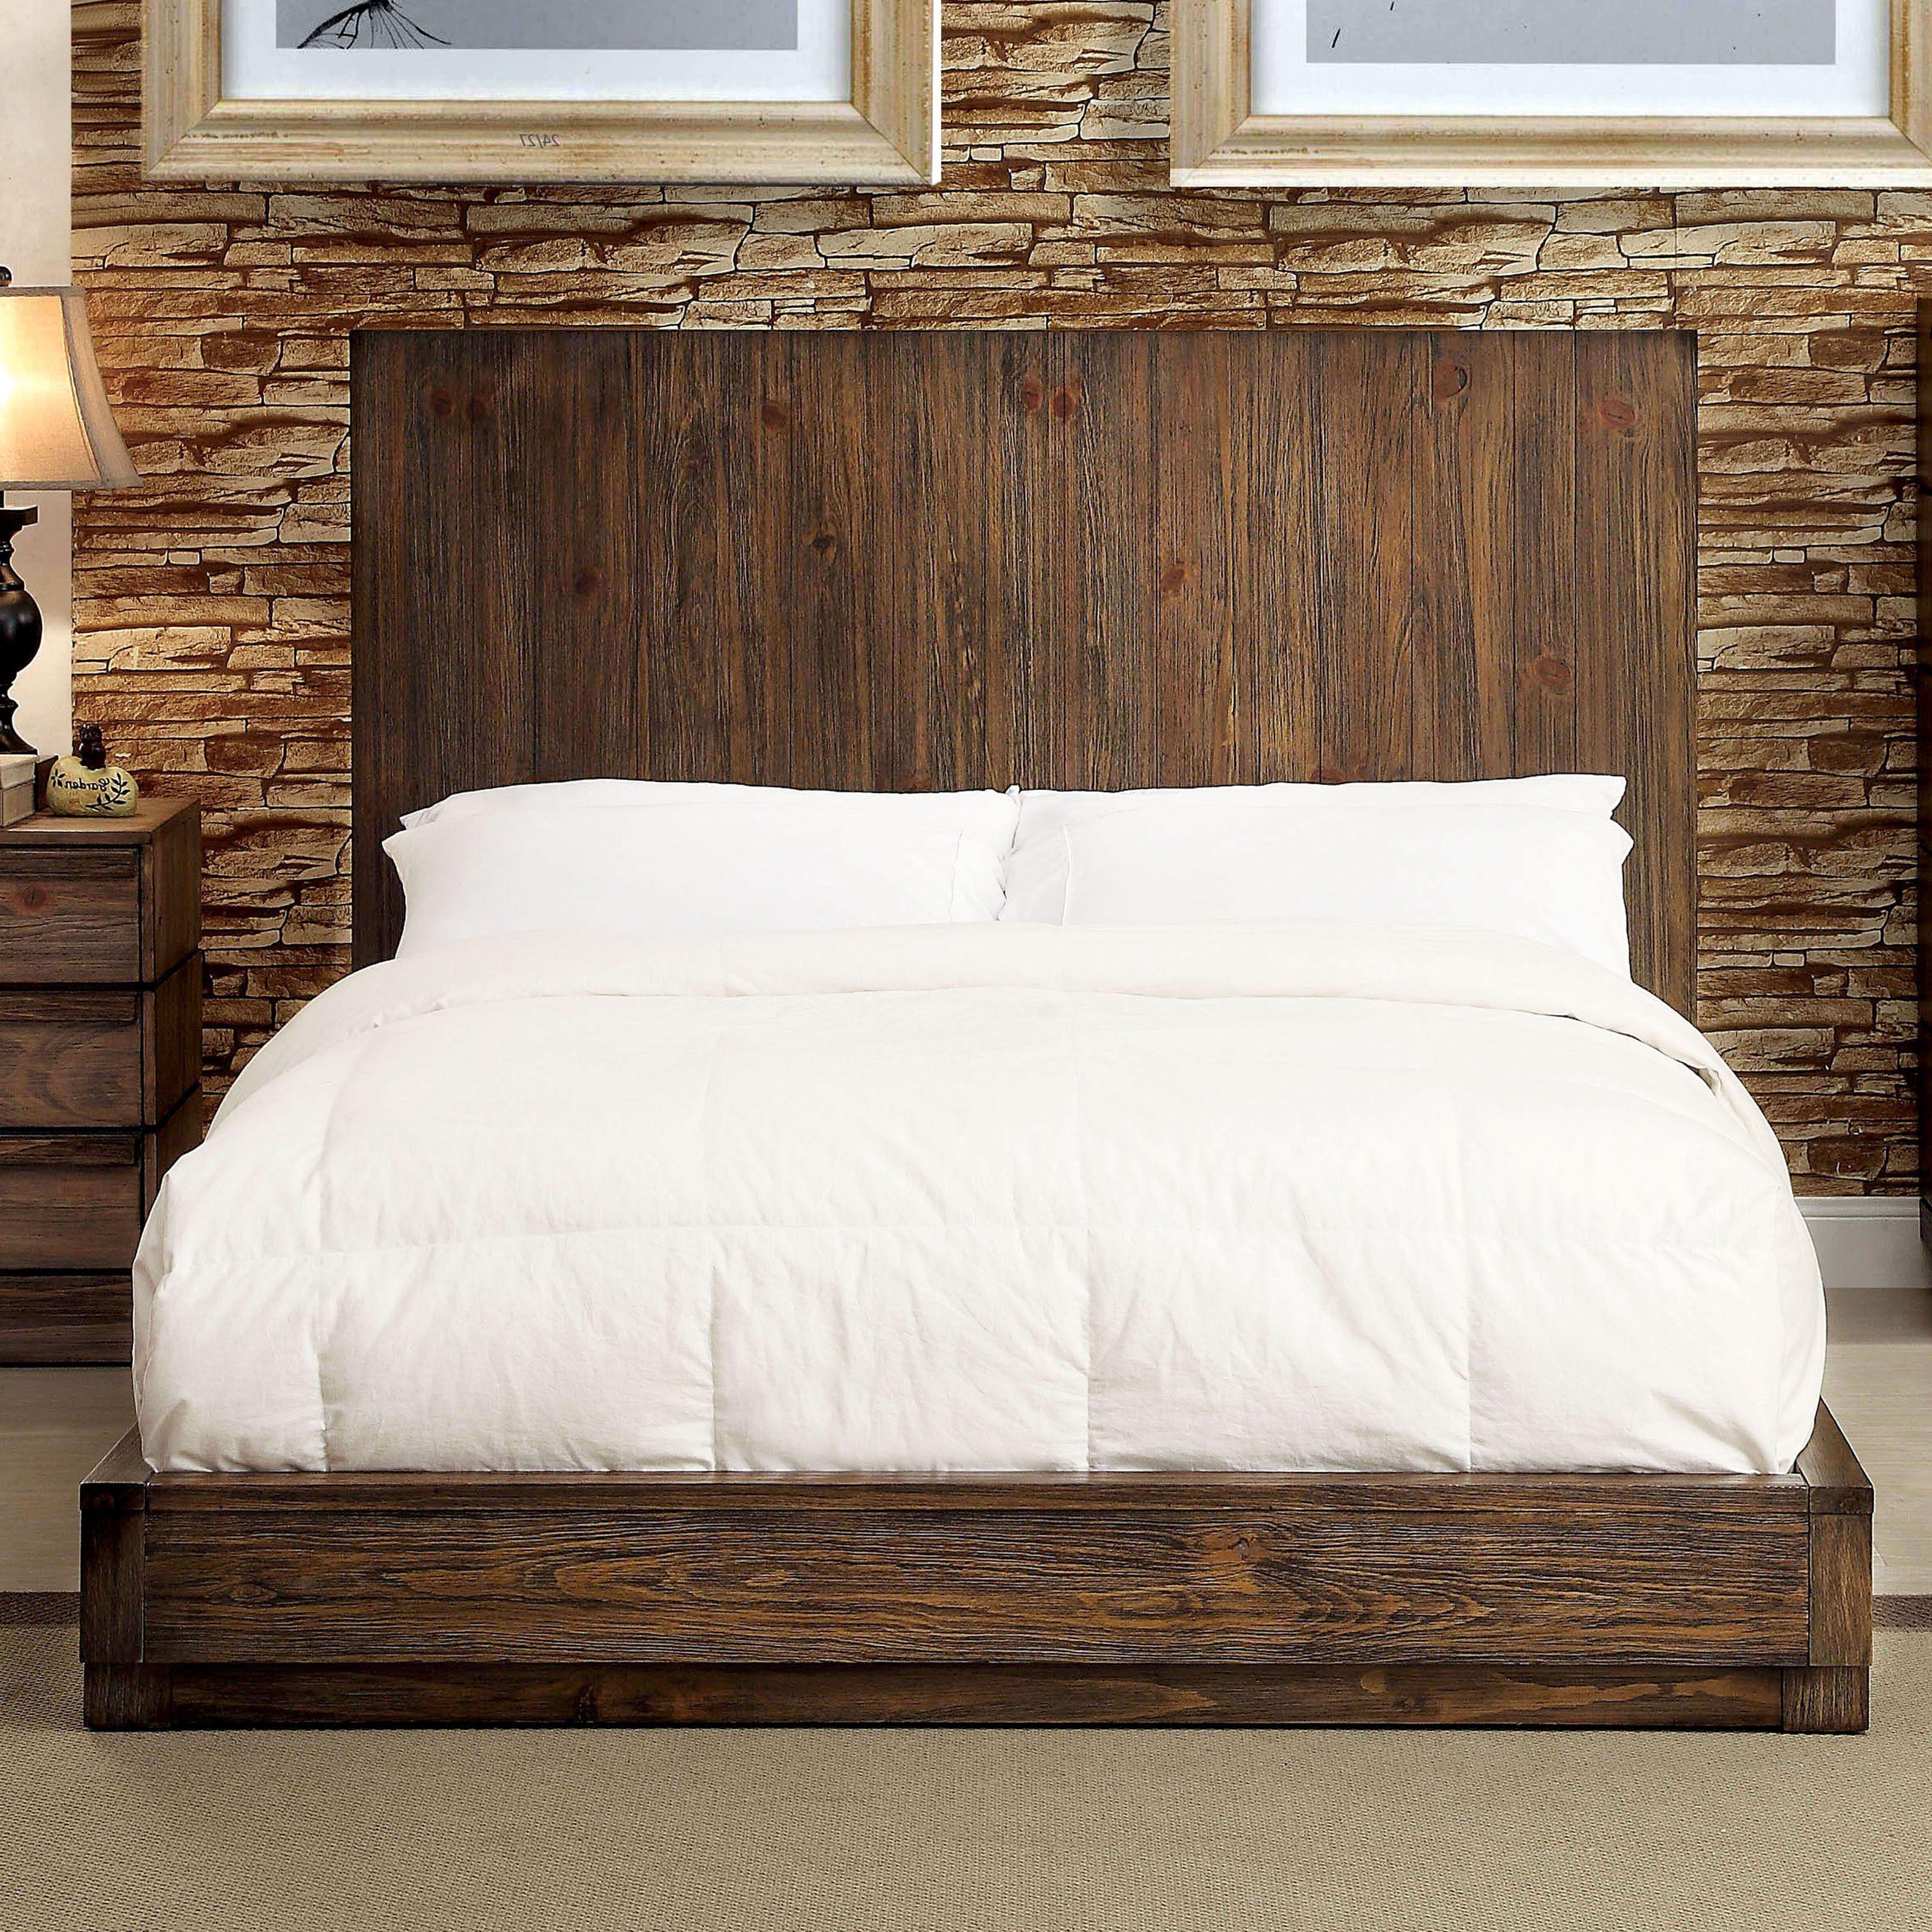 Furniture of america mercutio platform bed from hayneedle